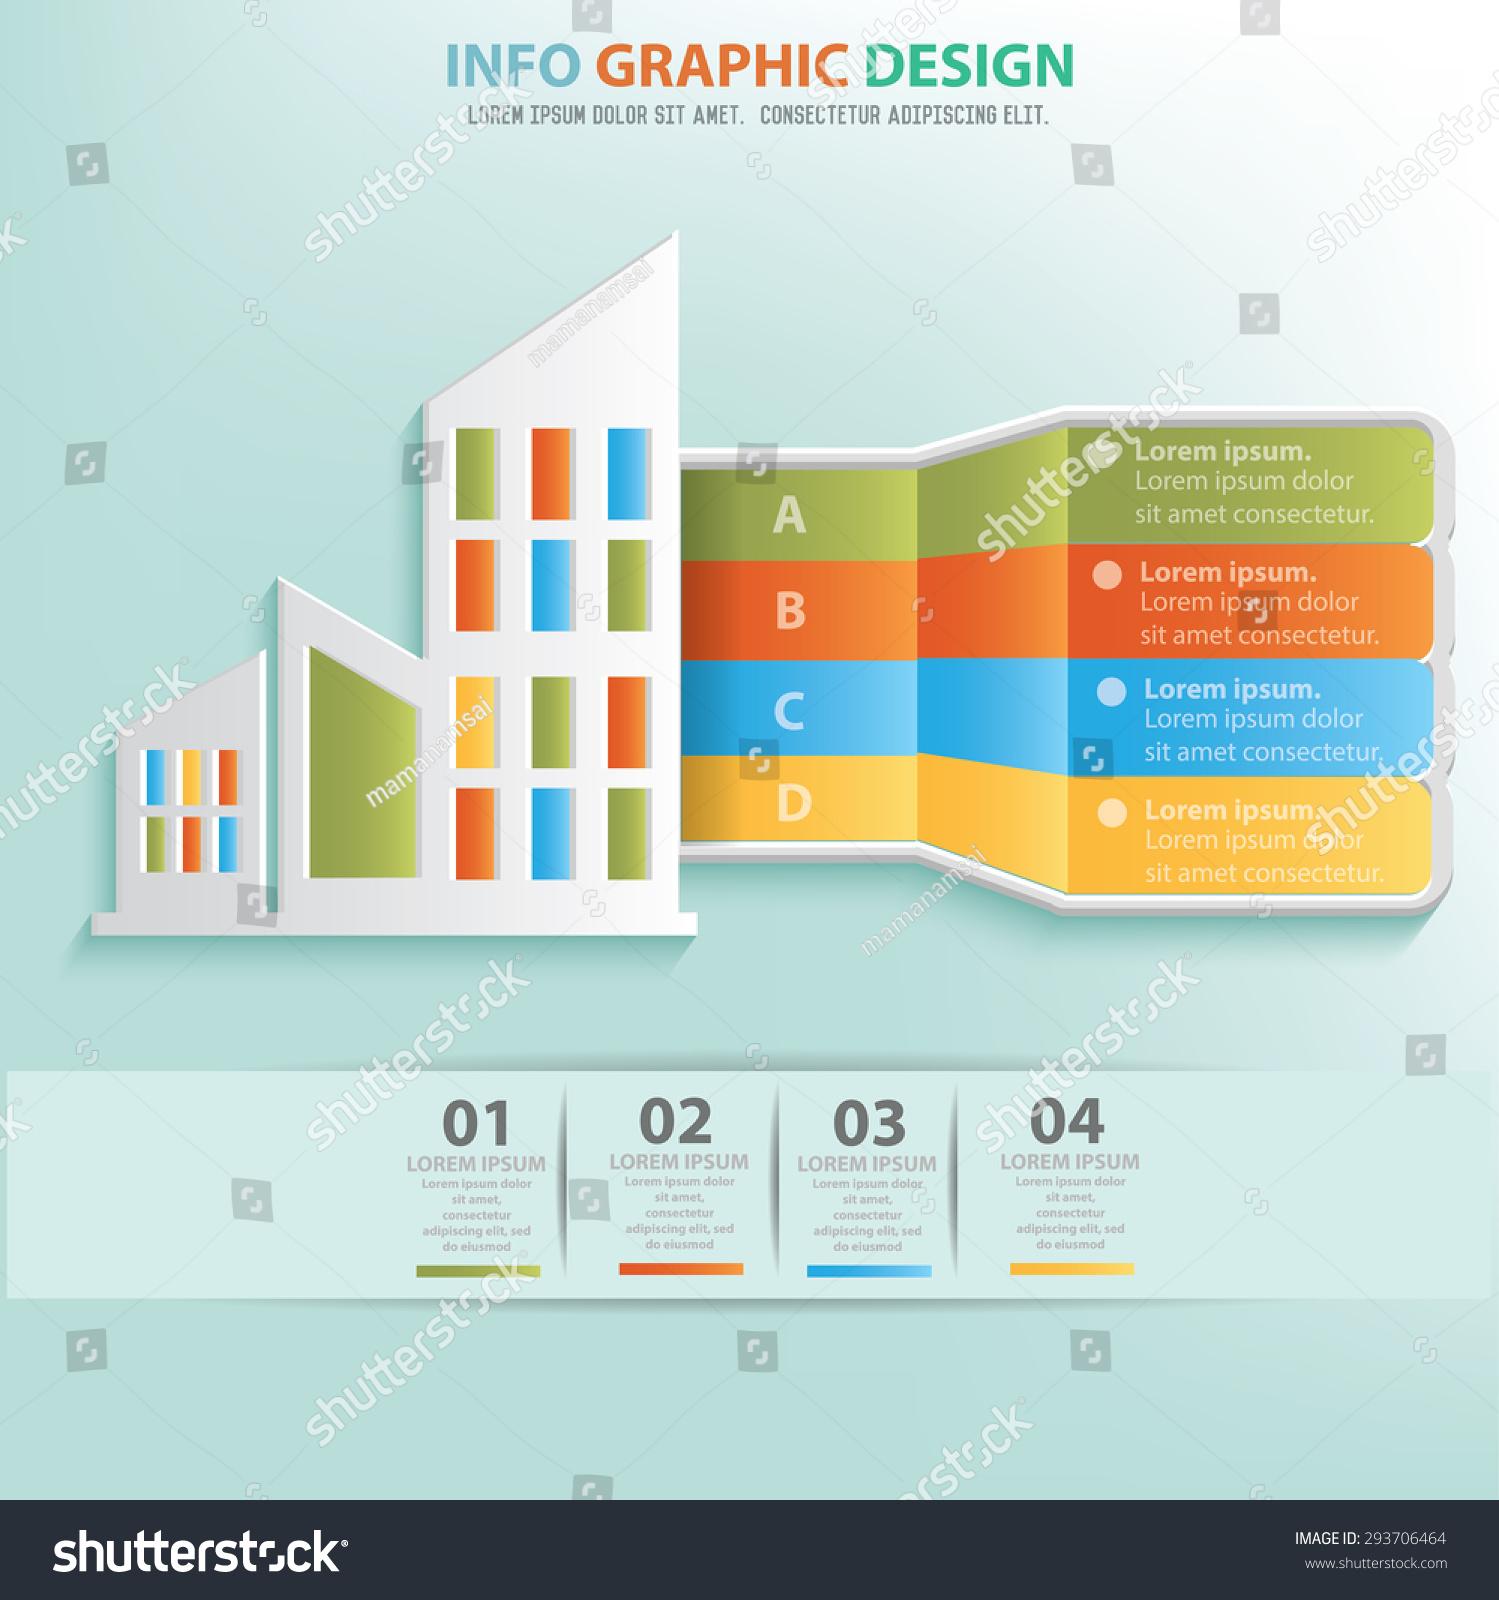 Real Estate Design : Real estate design info graphic designclean stock vector